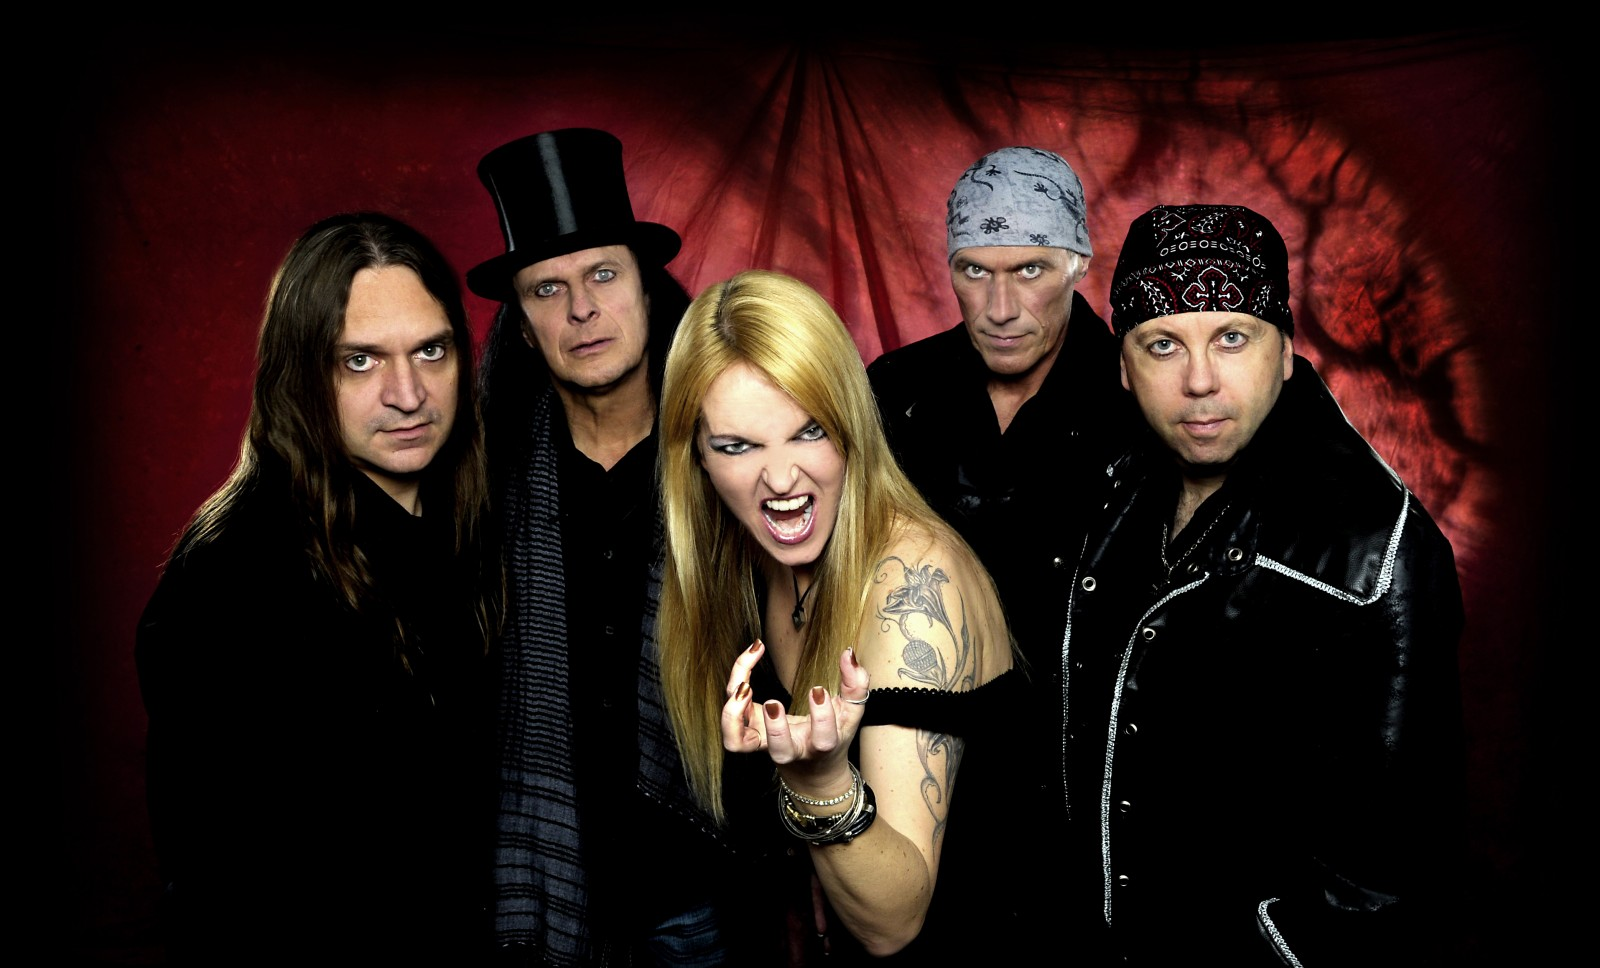 A Tribute To Nightwish